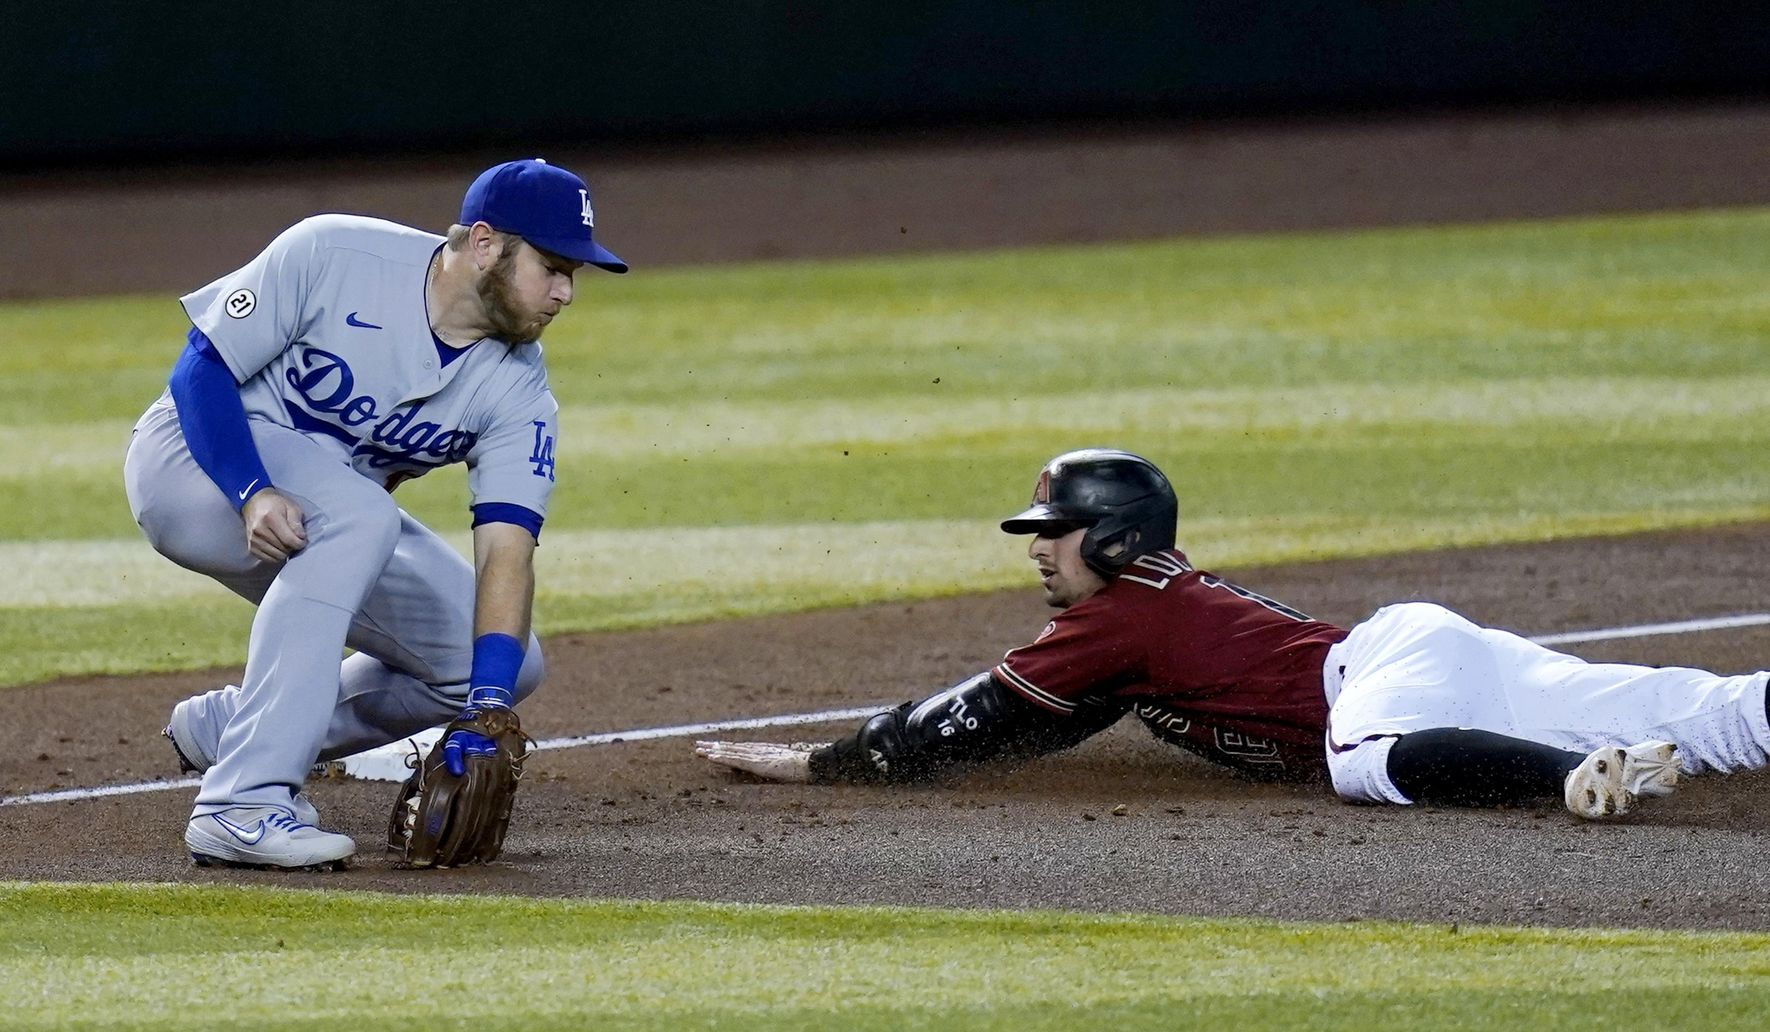 Dodgers_diamondbacks_baseball_98325_c0-151-3600-2249_s1770x1032